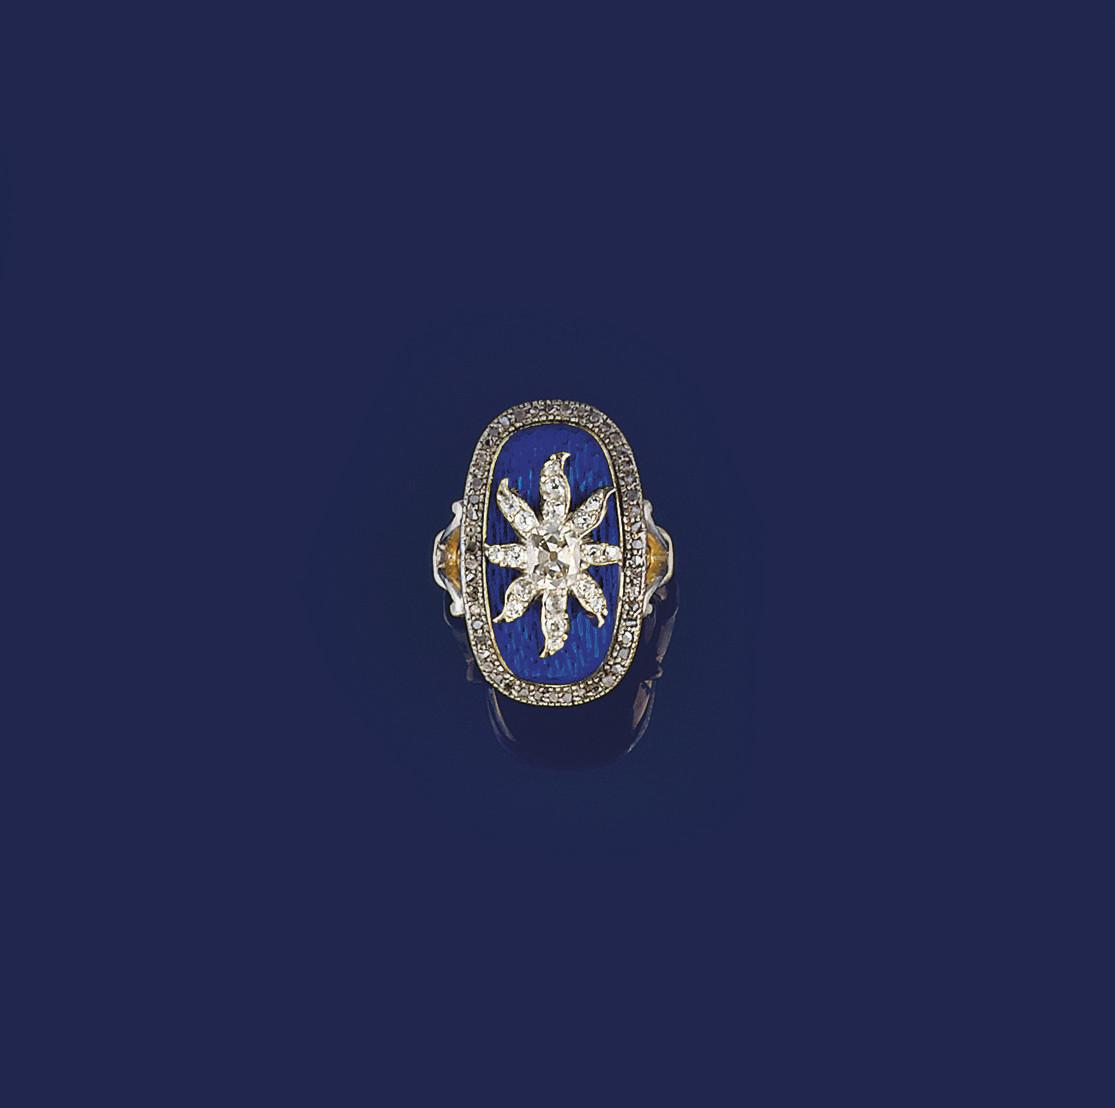 A 19th century diamond and ena